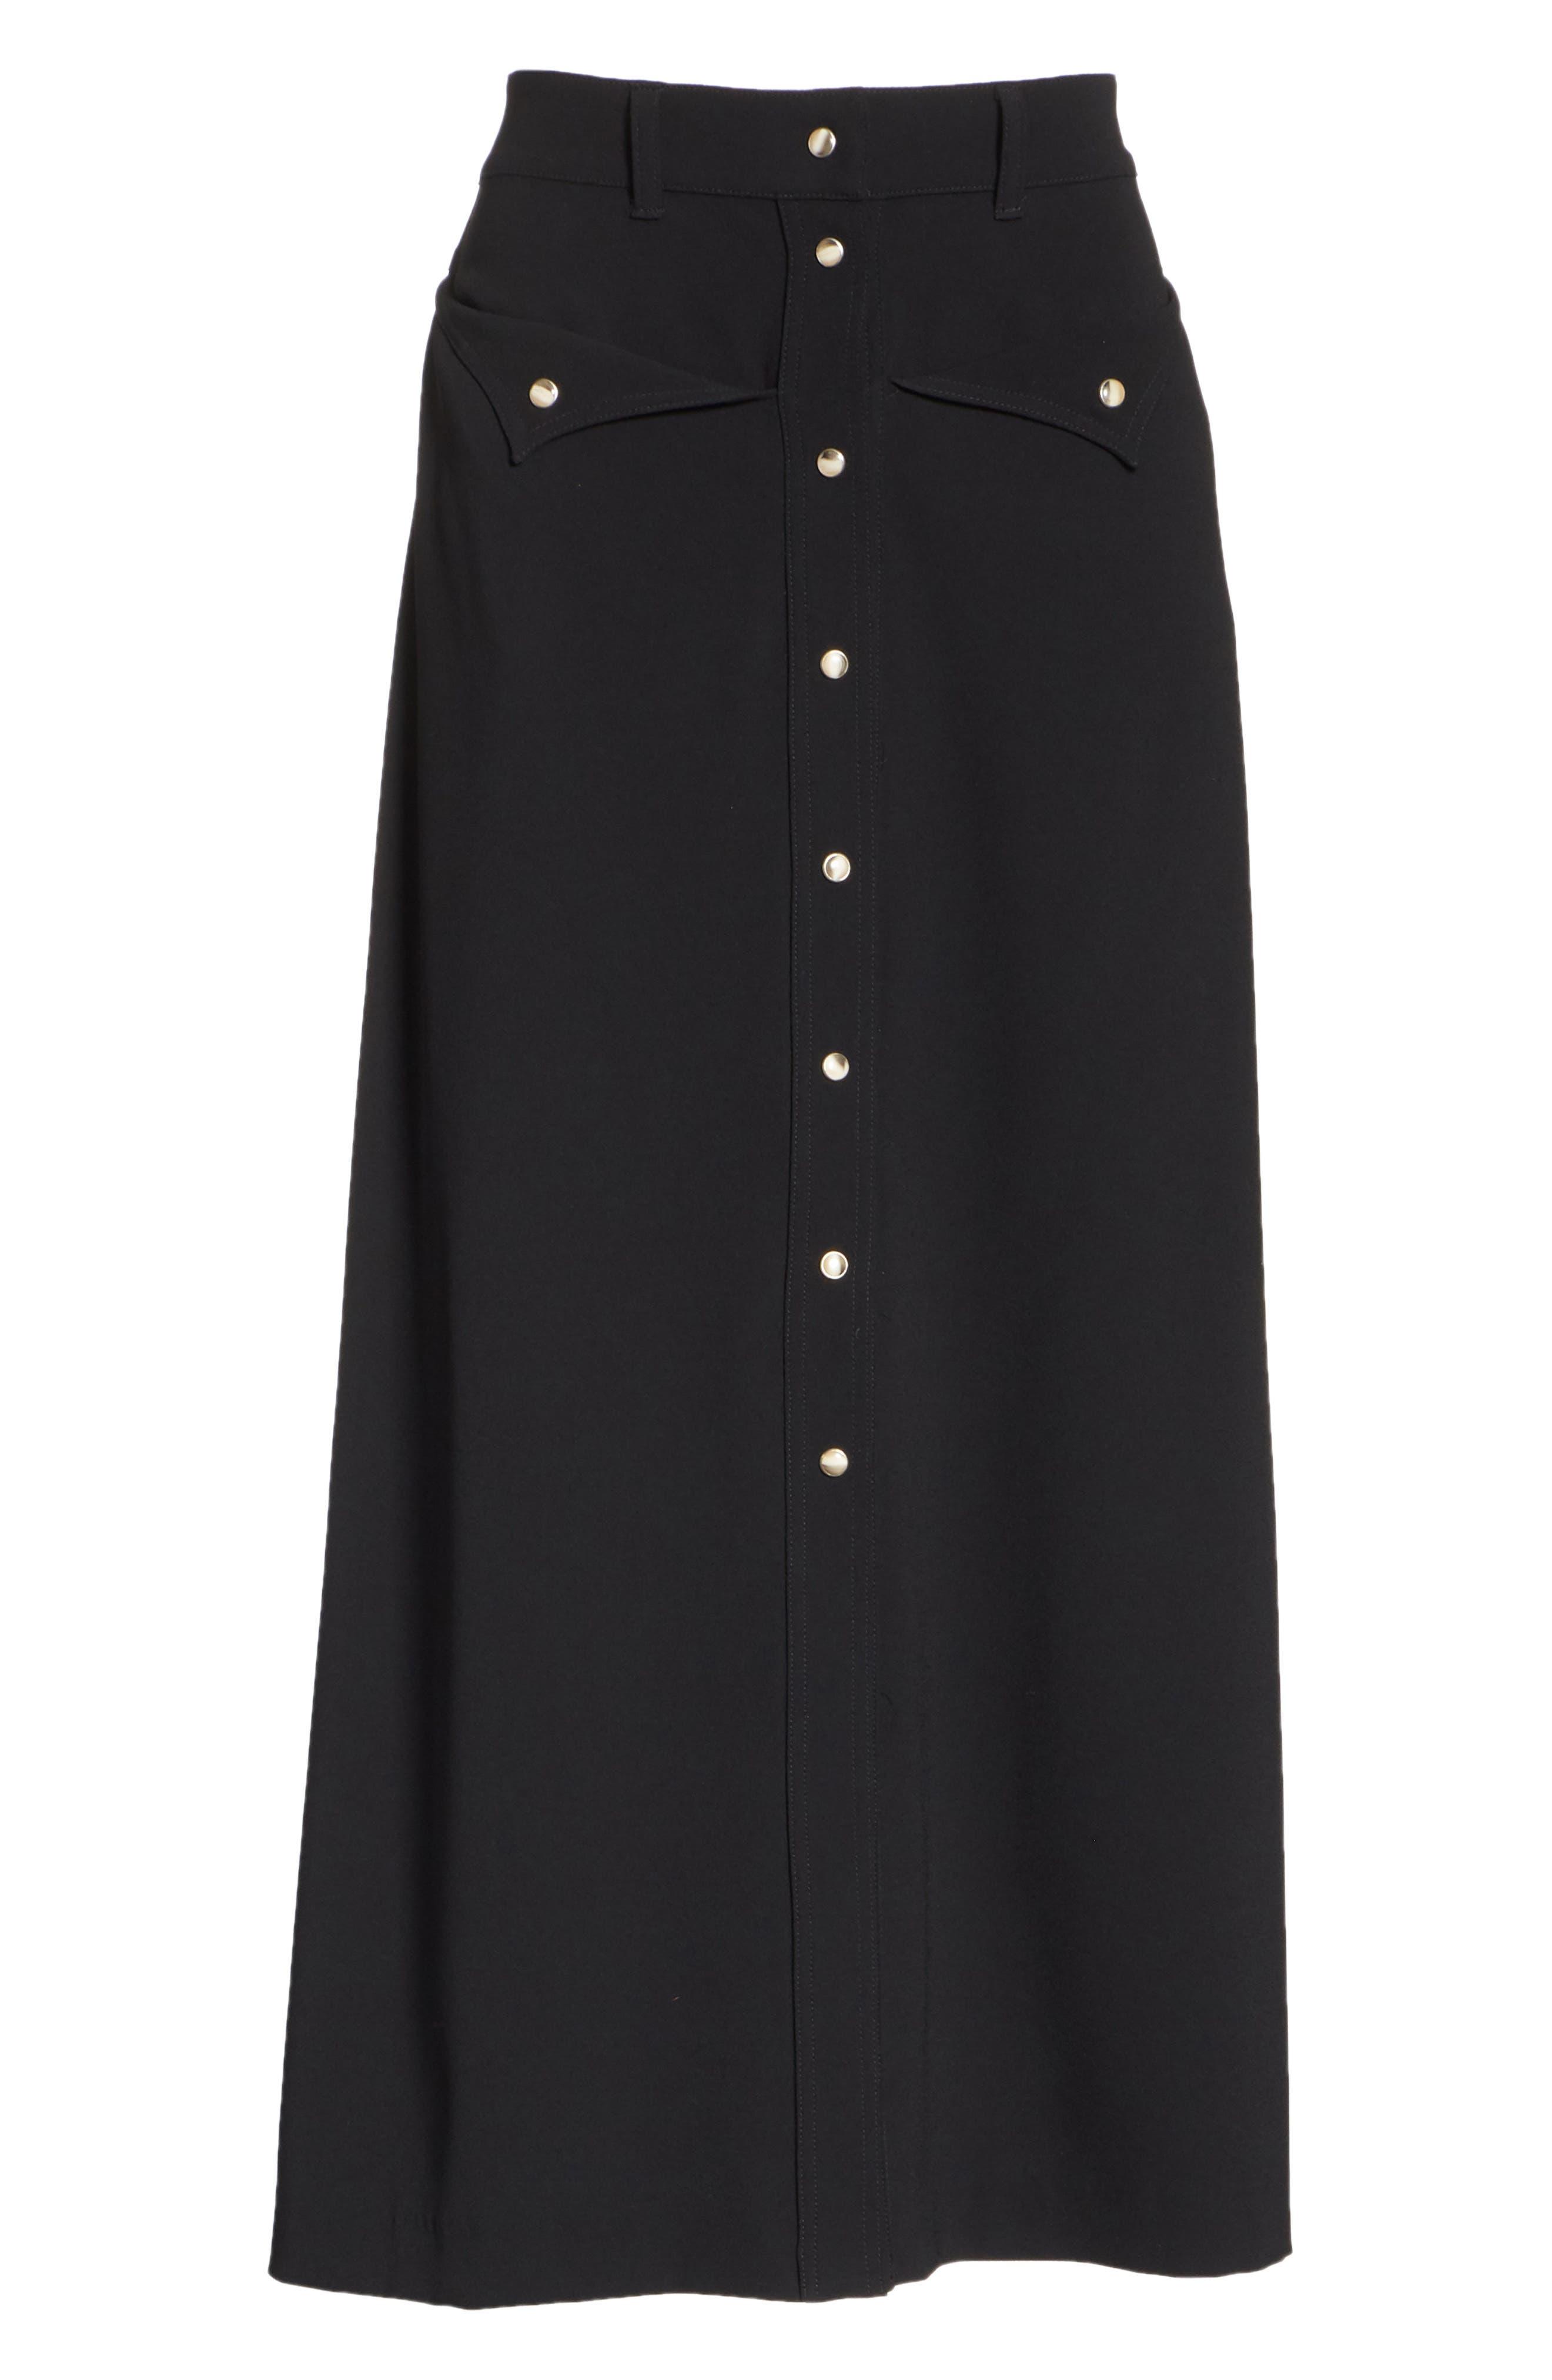 Meida Midi Skirt,                             Alternate thumbnail 6, color,                             003